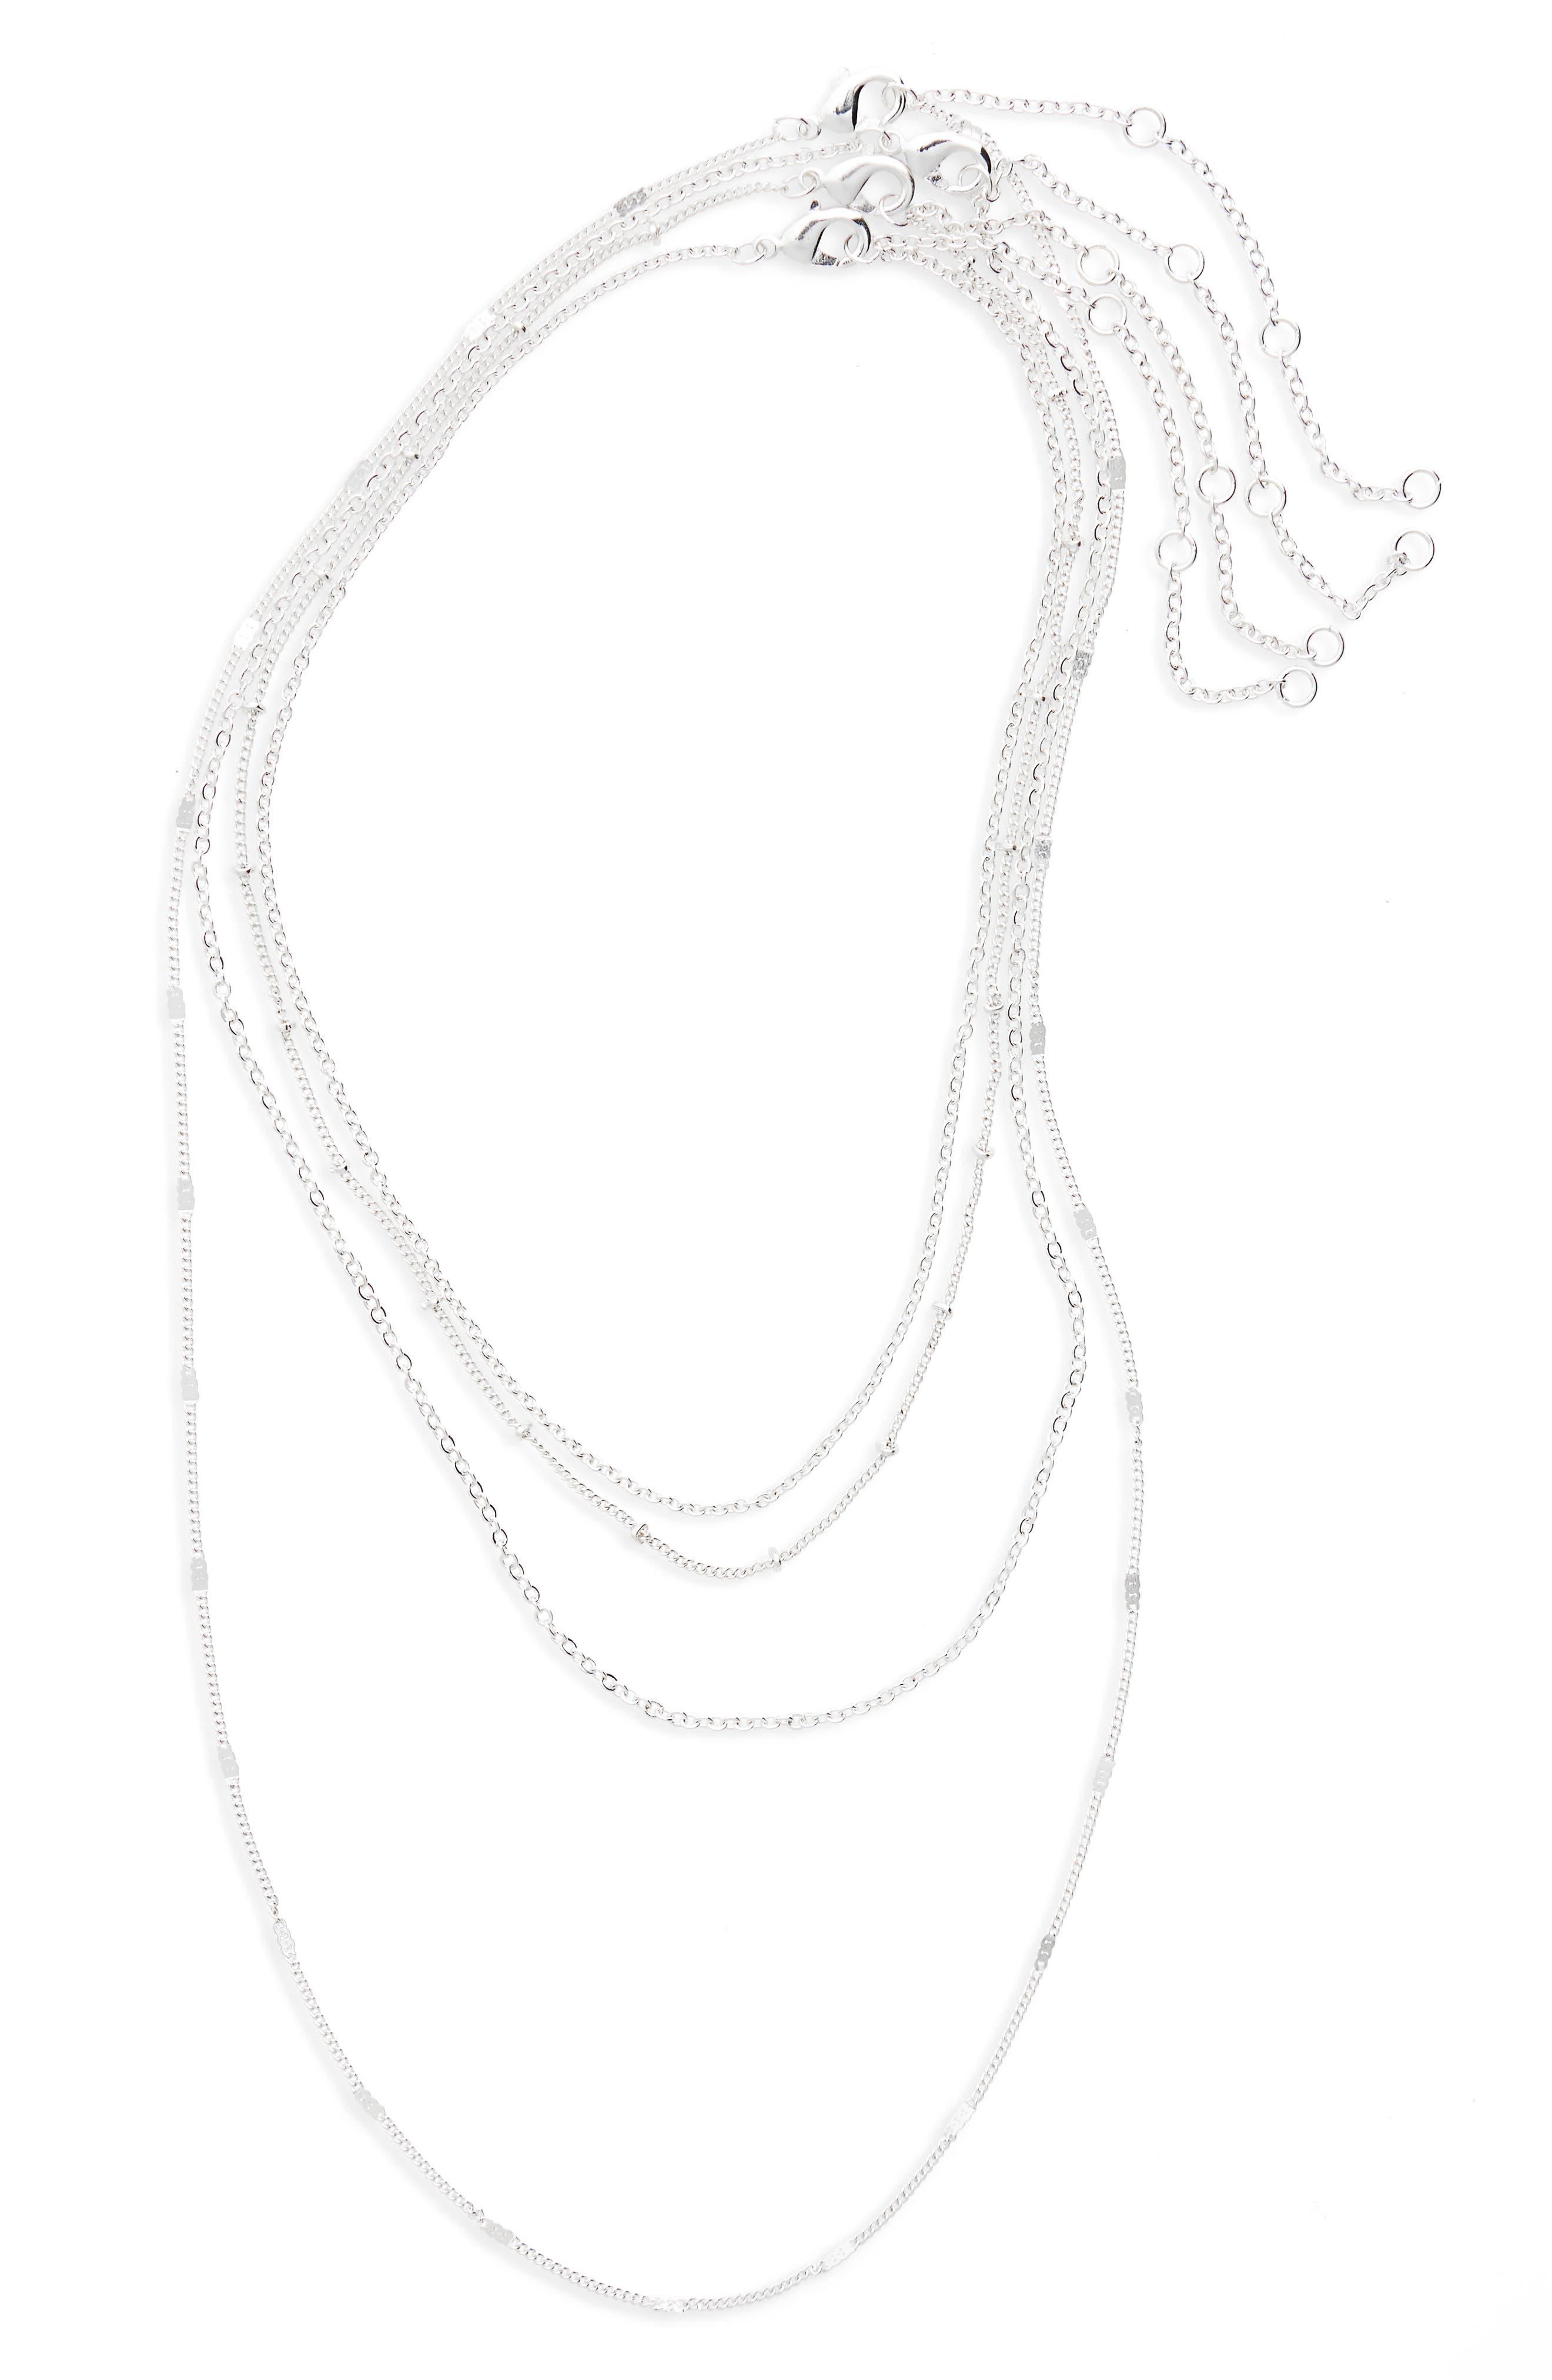 4-Pack Chain Necklaces,                             Main thumbnail 1, color,                             040